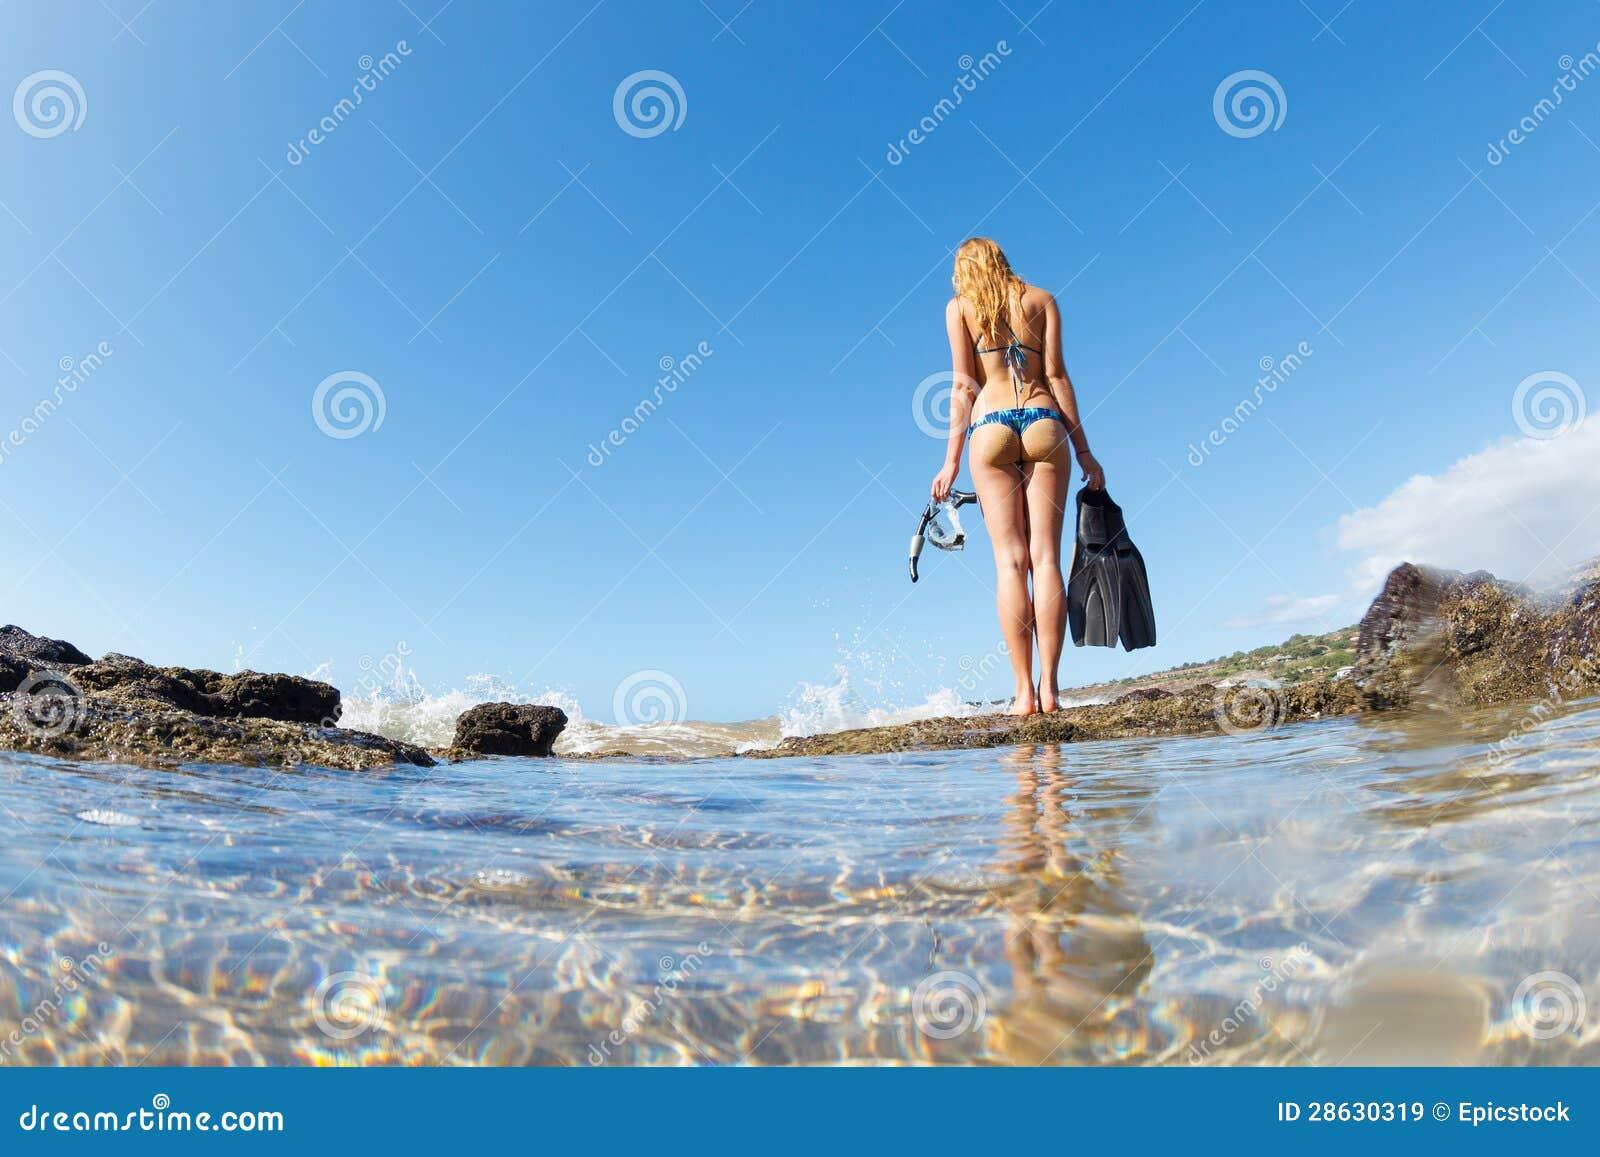 Free Clipart Girl Walking